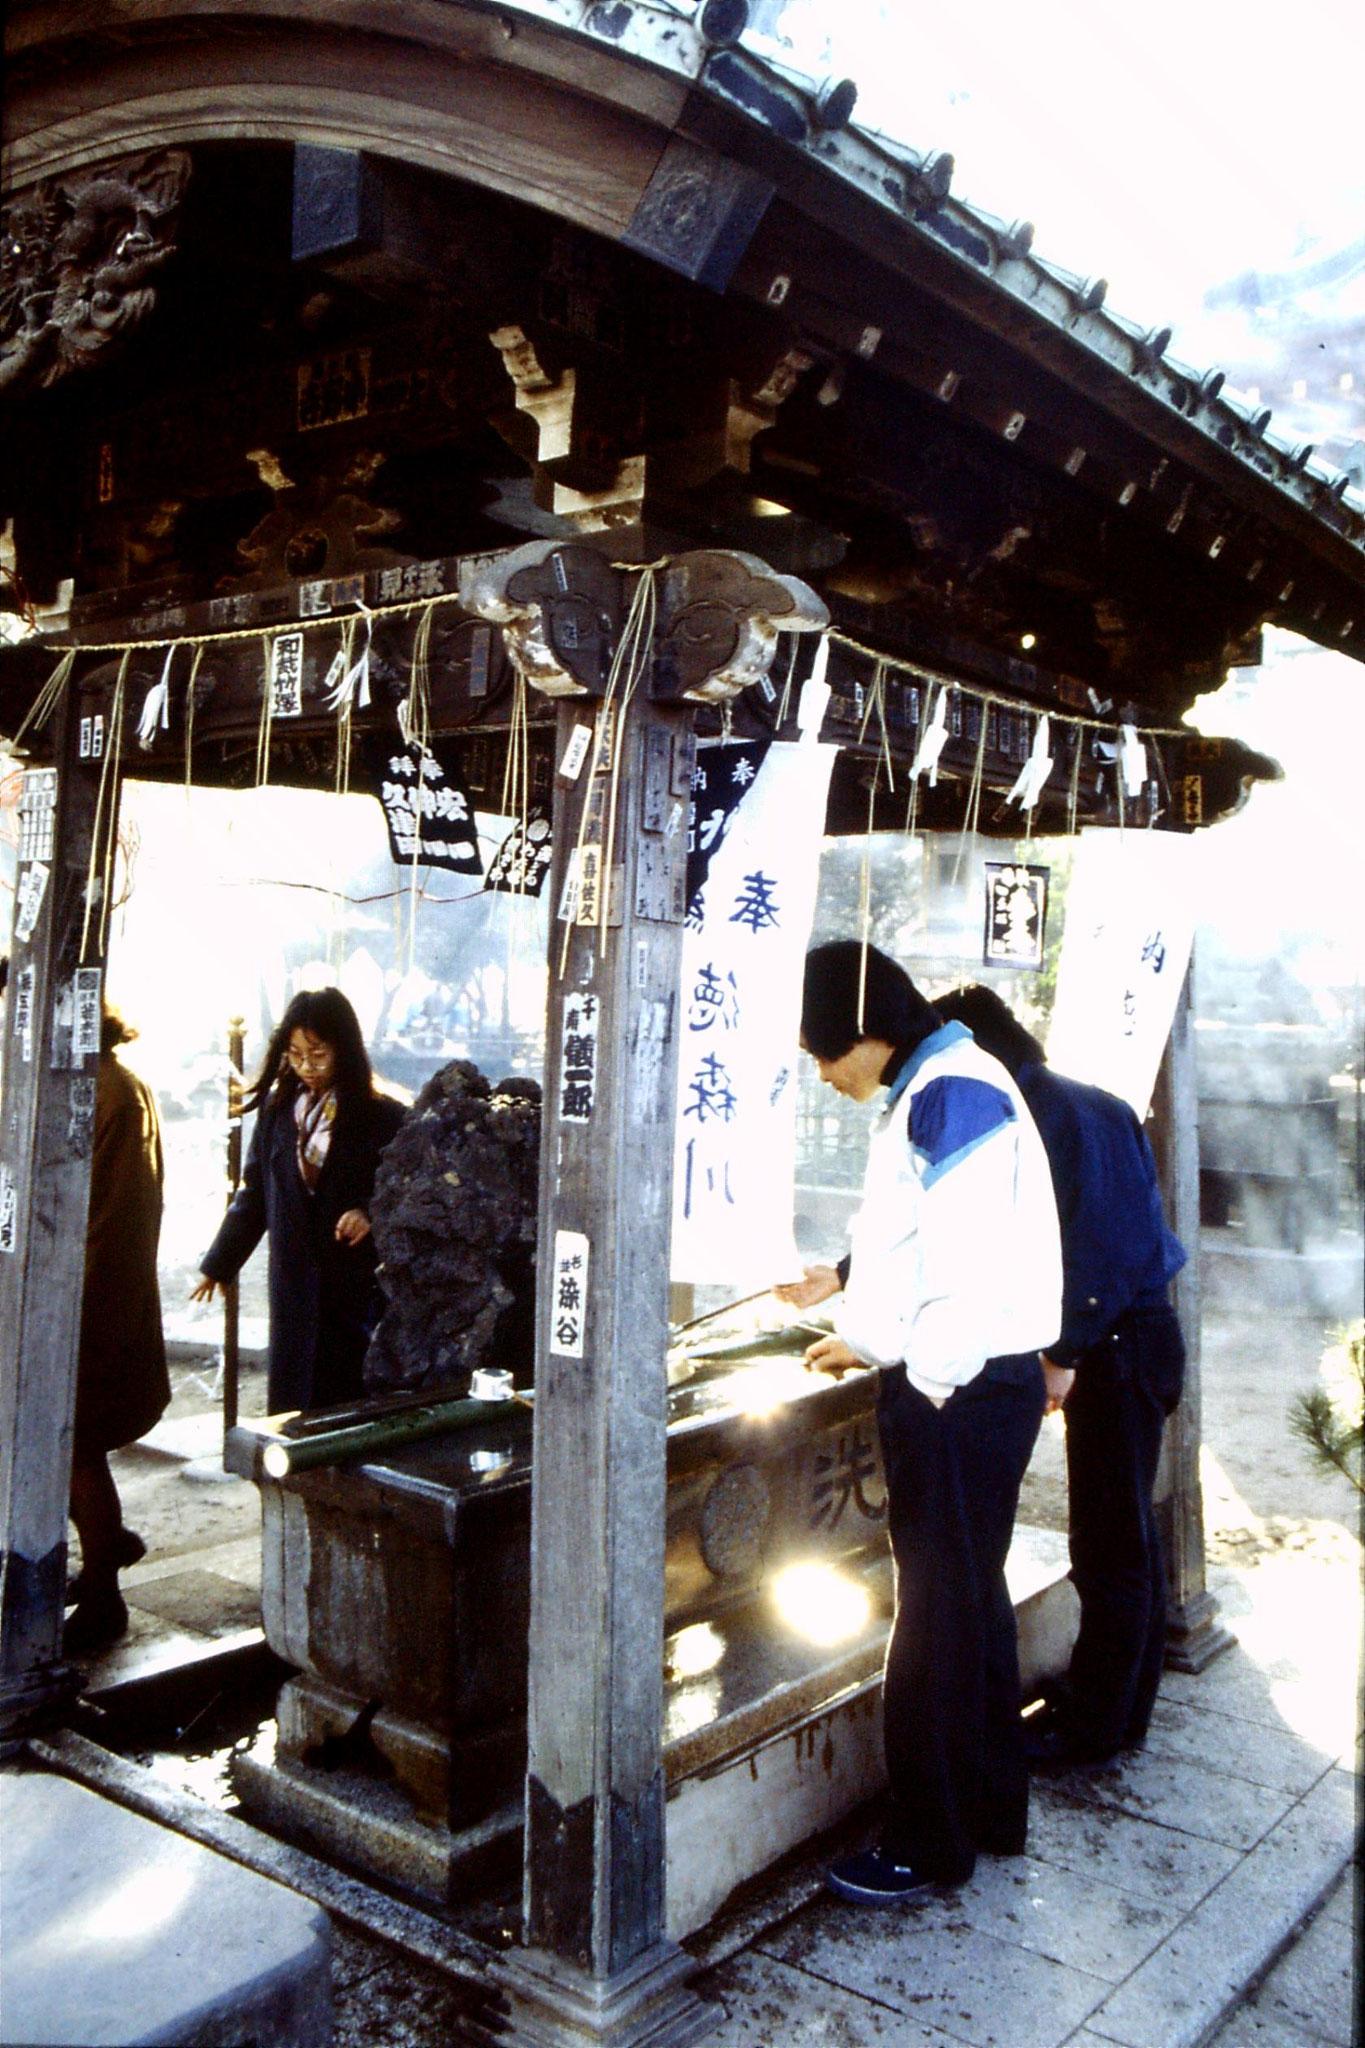 4/1/1989: 0: Ueno Park